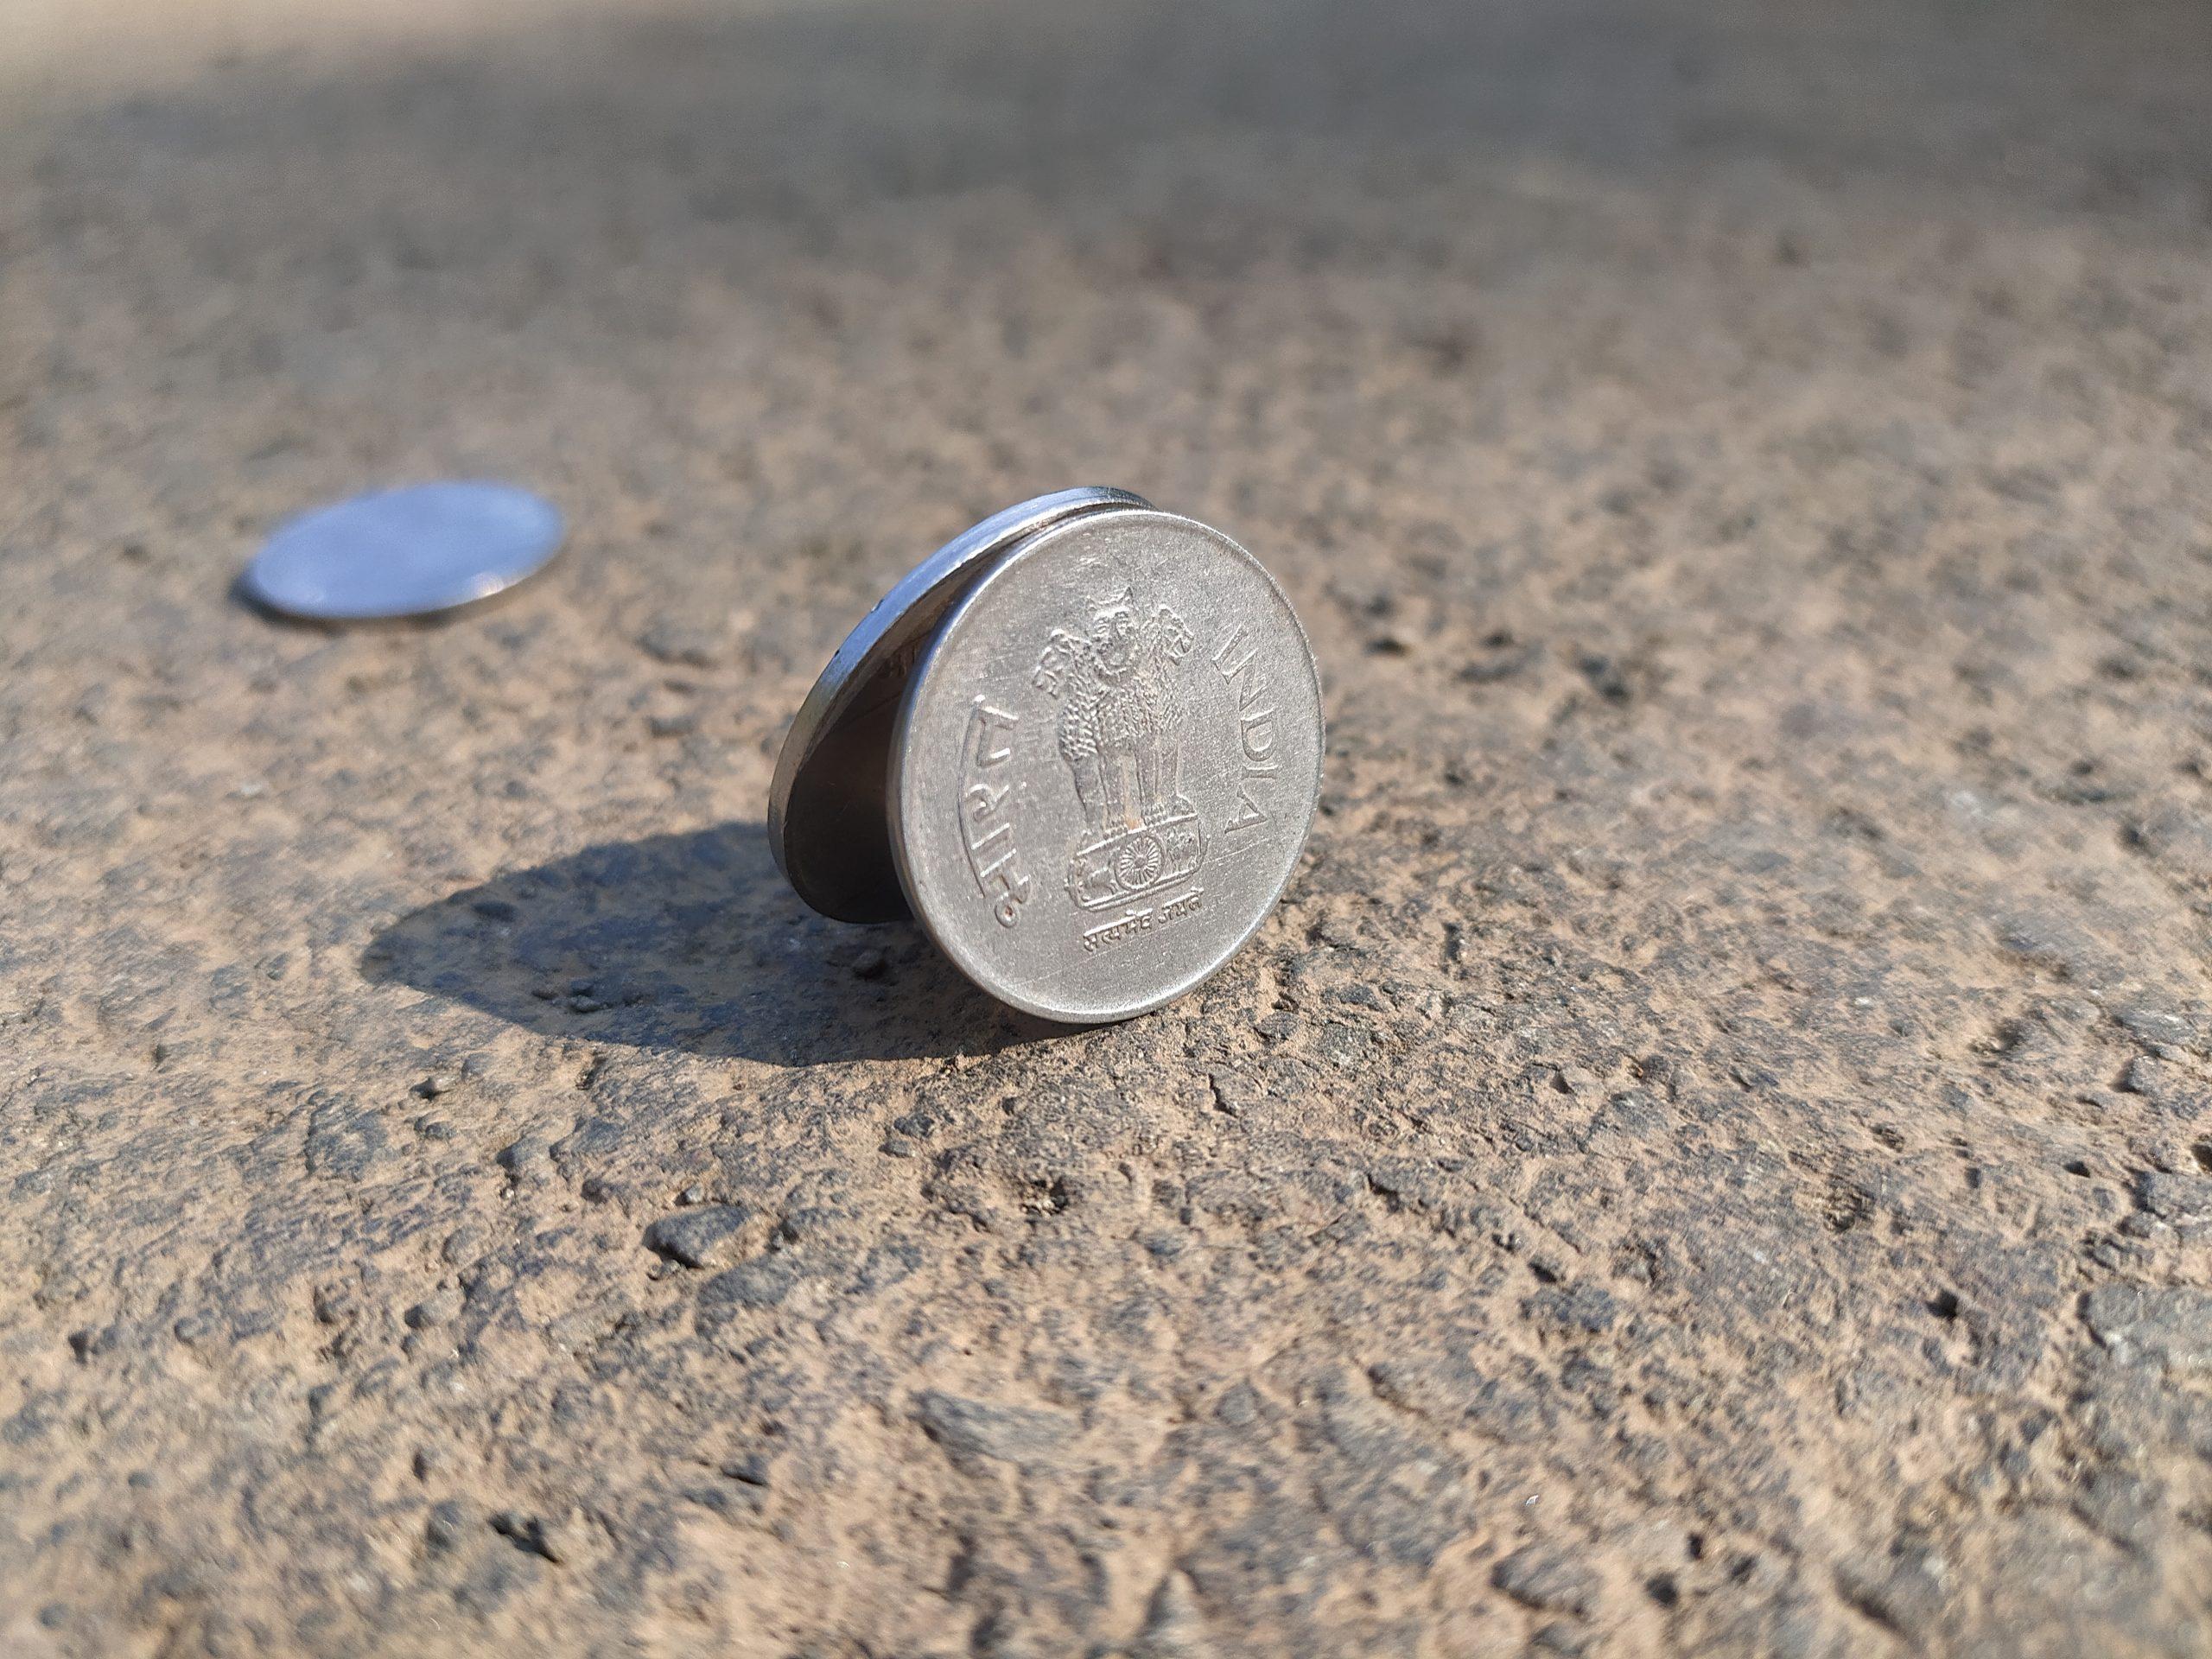 Coins on ground